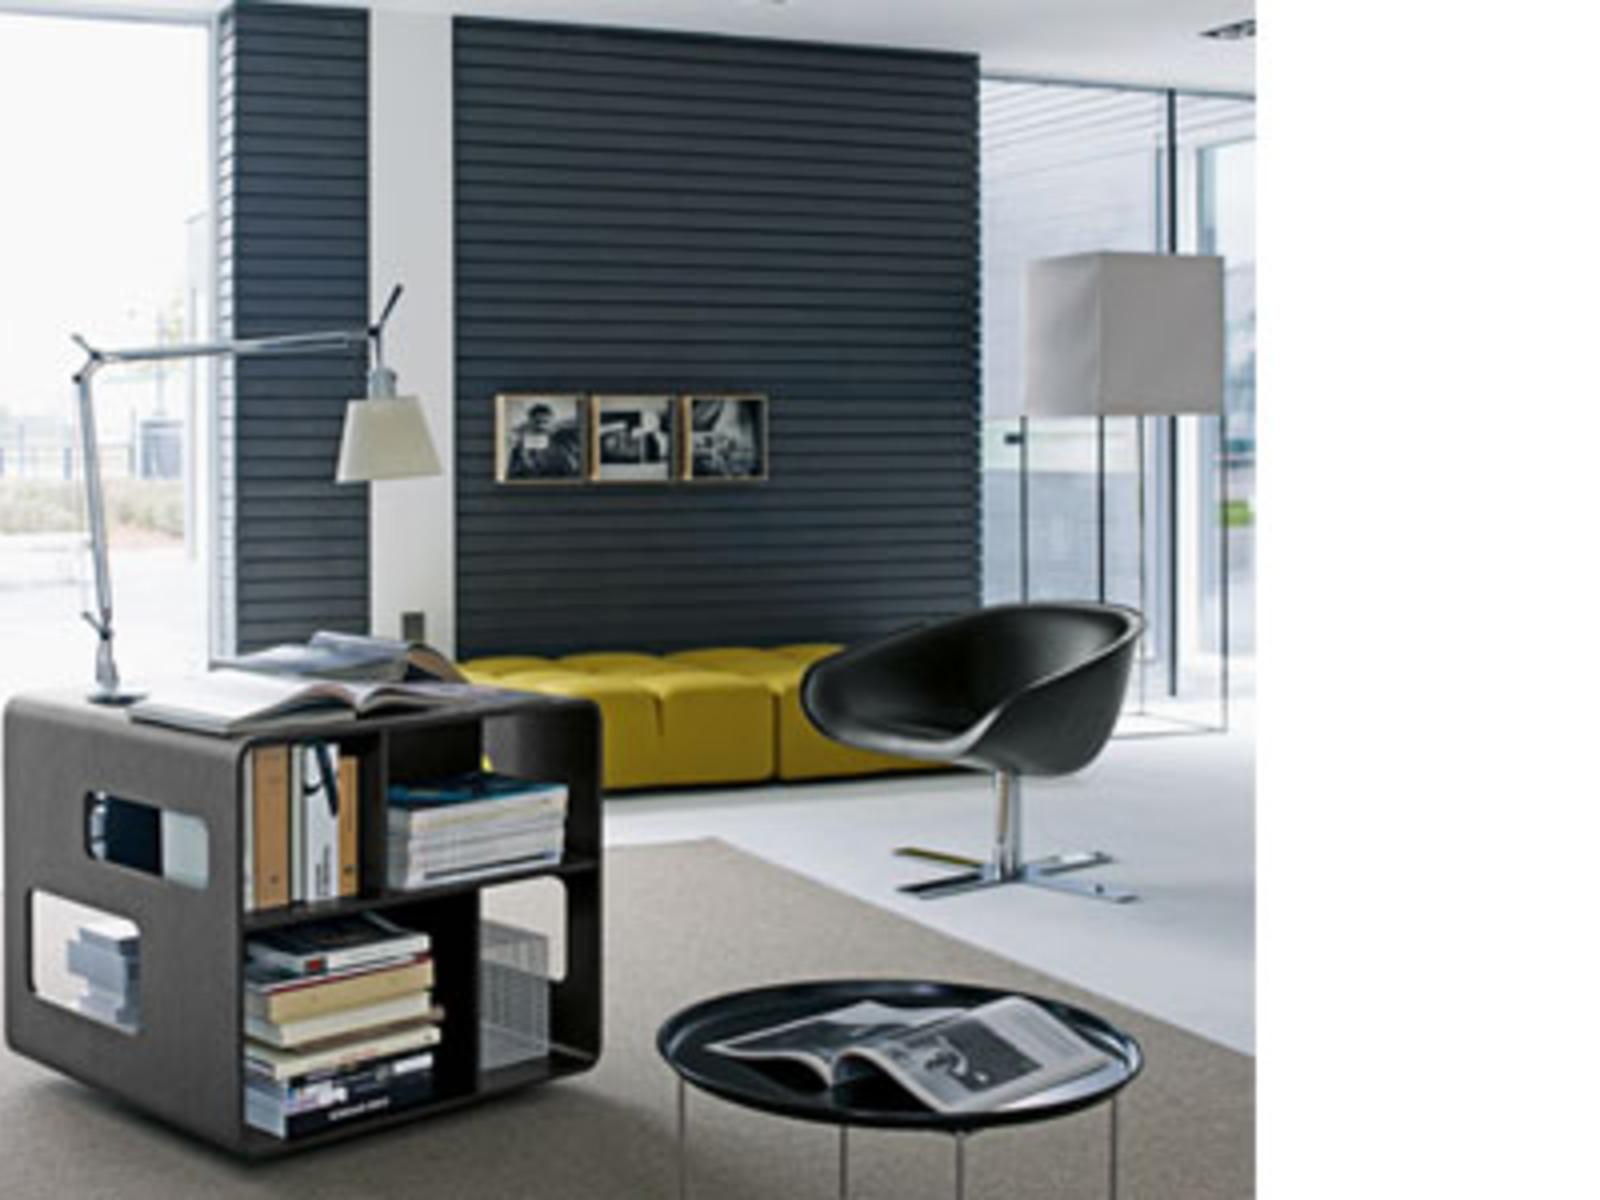 Planit Fertighaus Studio Bestetti Associati | Floornature